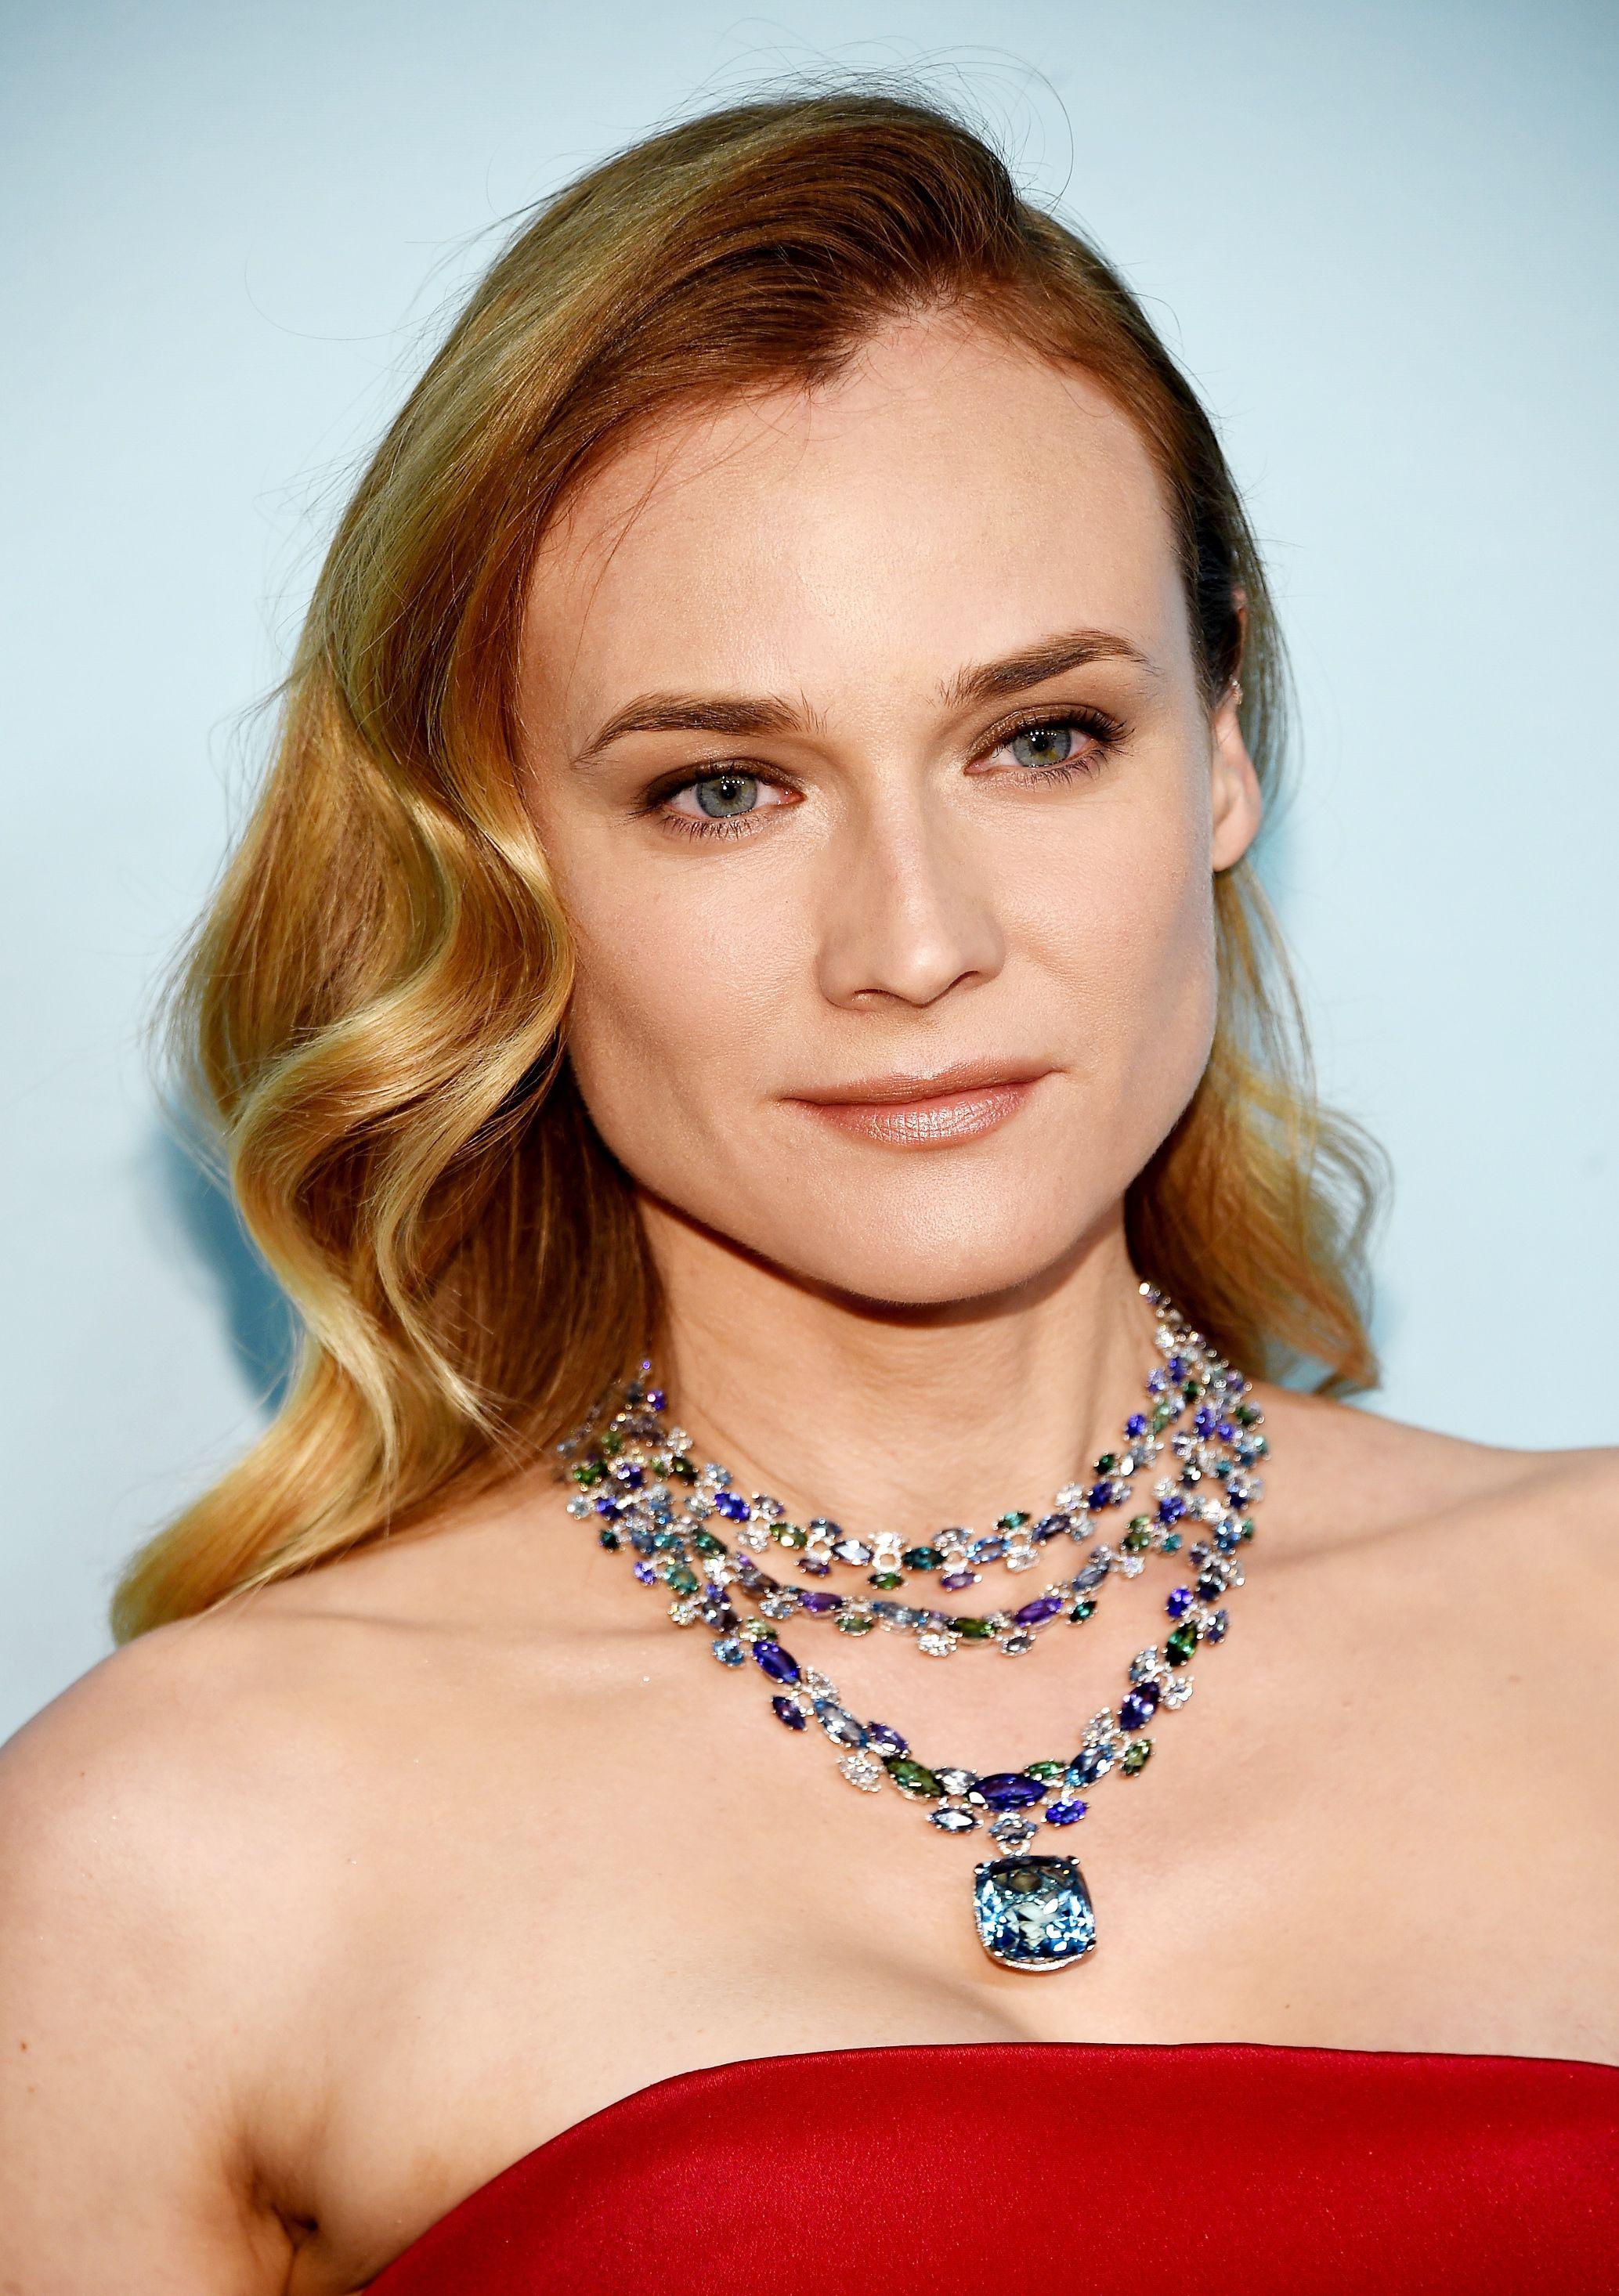 Selfie Diane Kruger nude photos 2019